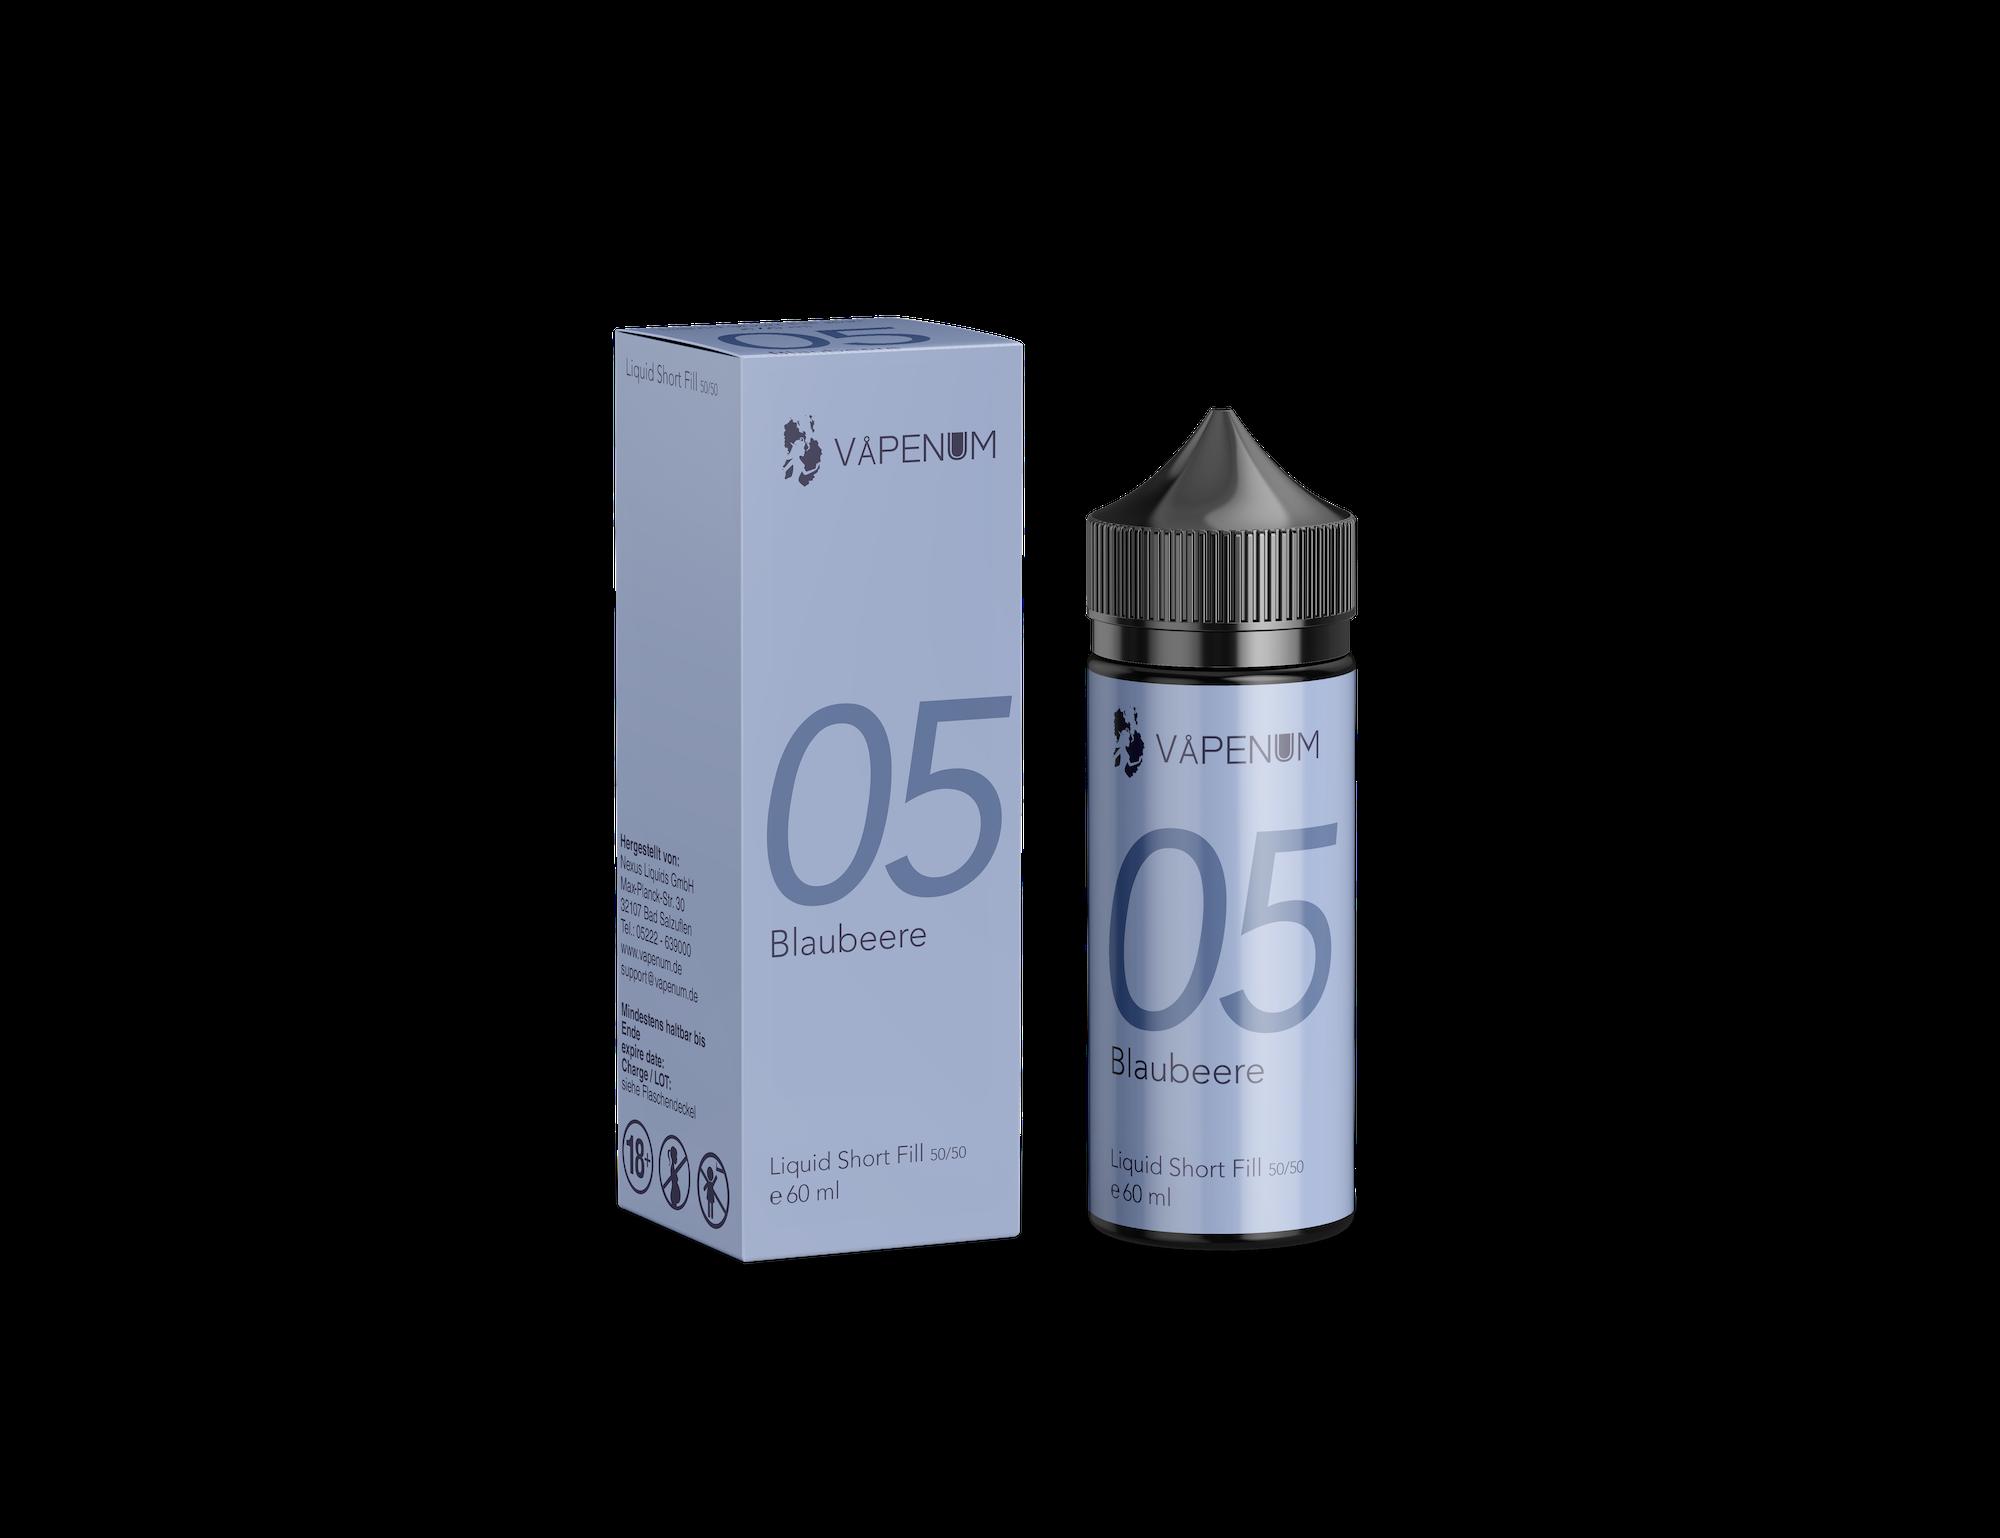 Vapenum Shortfill 05 - Blaubeere